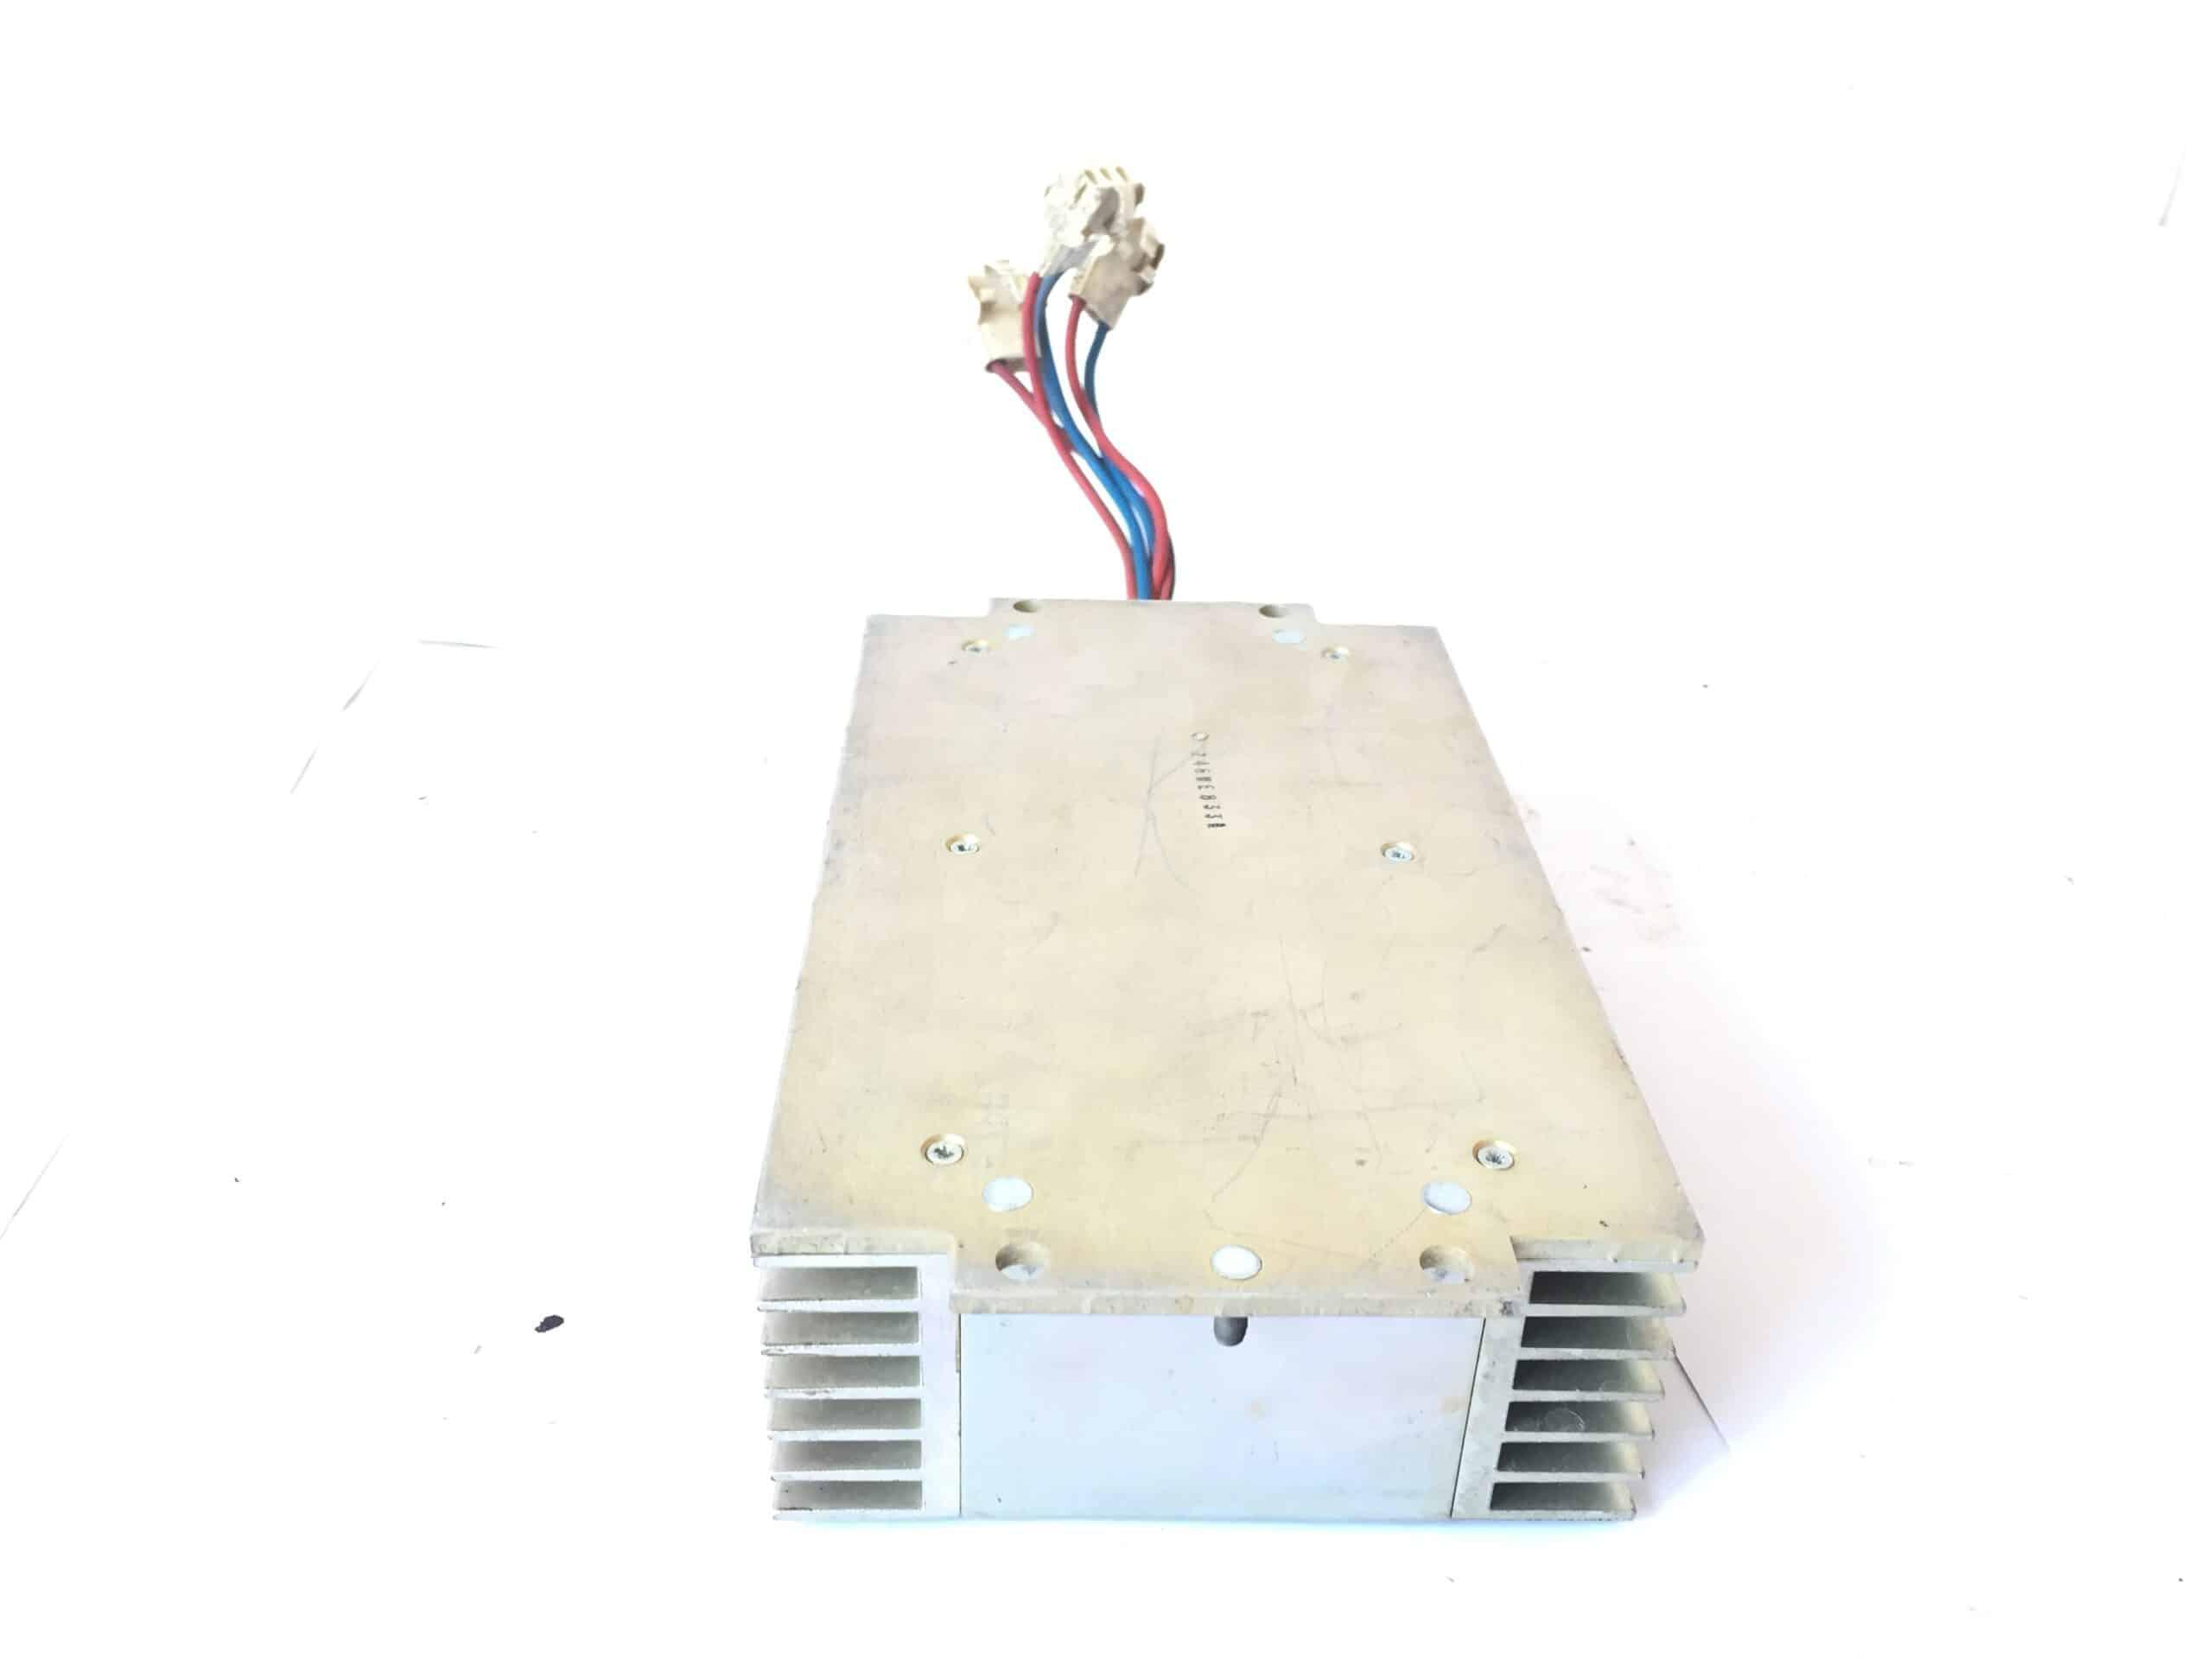   Voltage Transformer   Fazl-e-Rasheed and Company October 2021